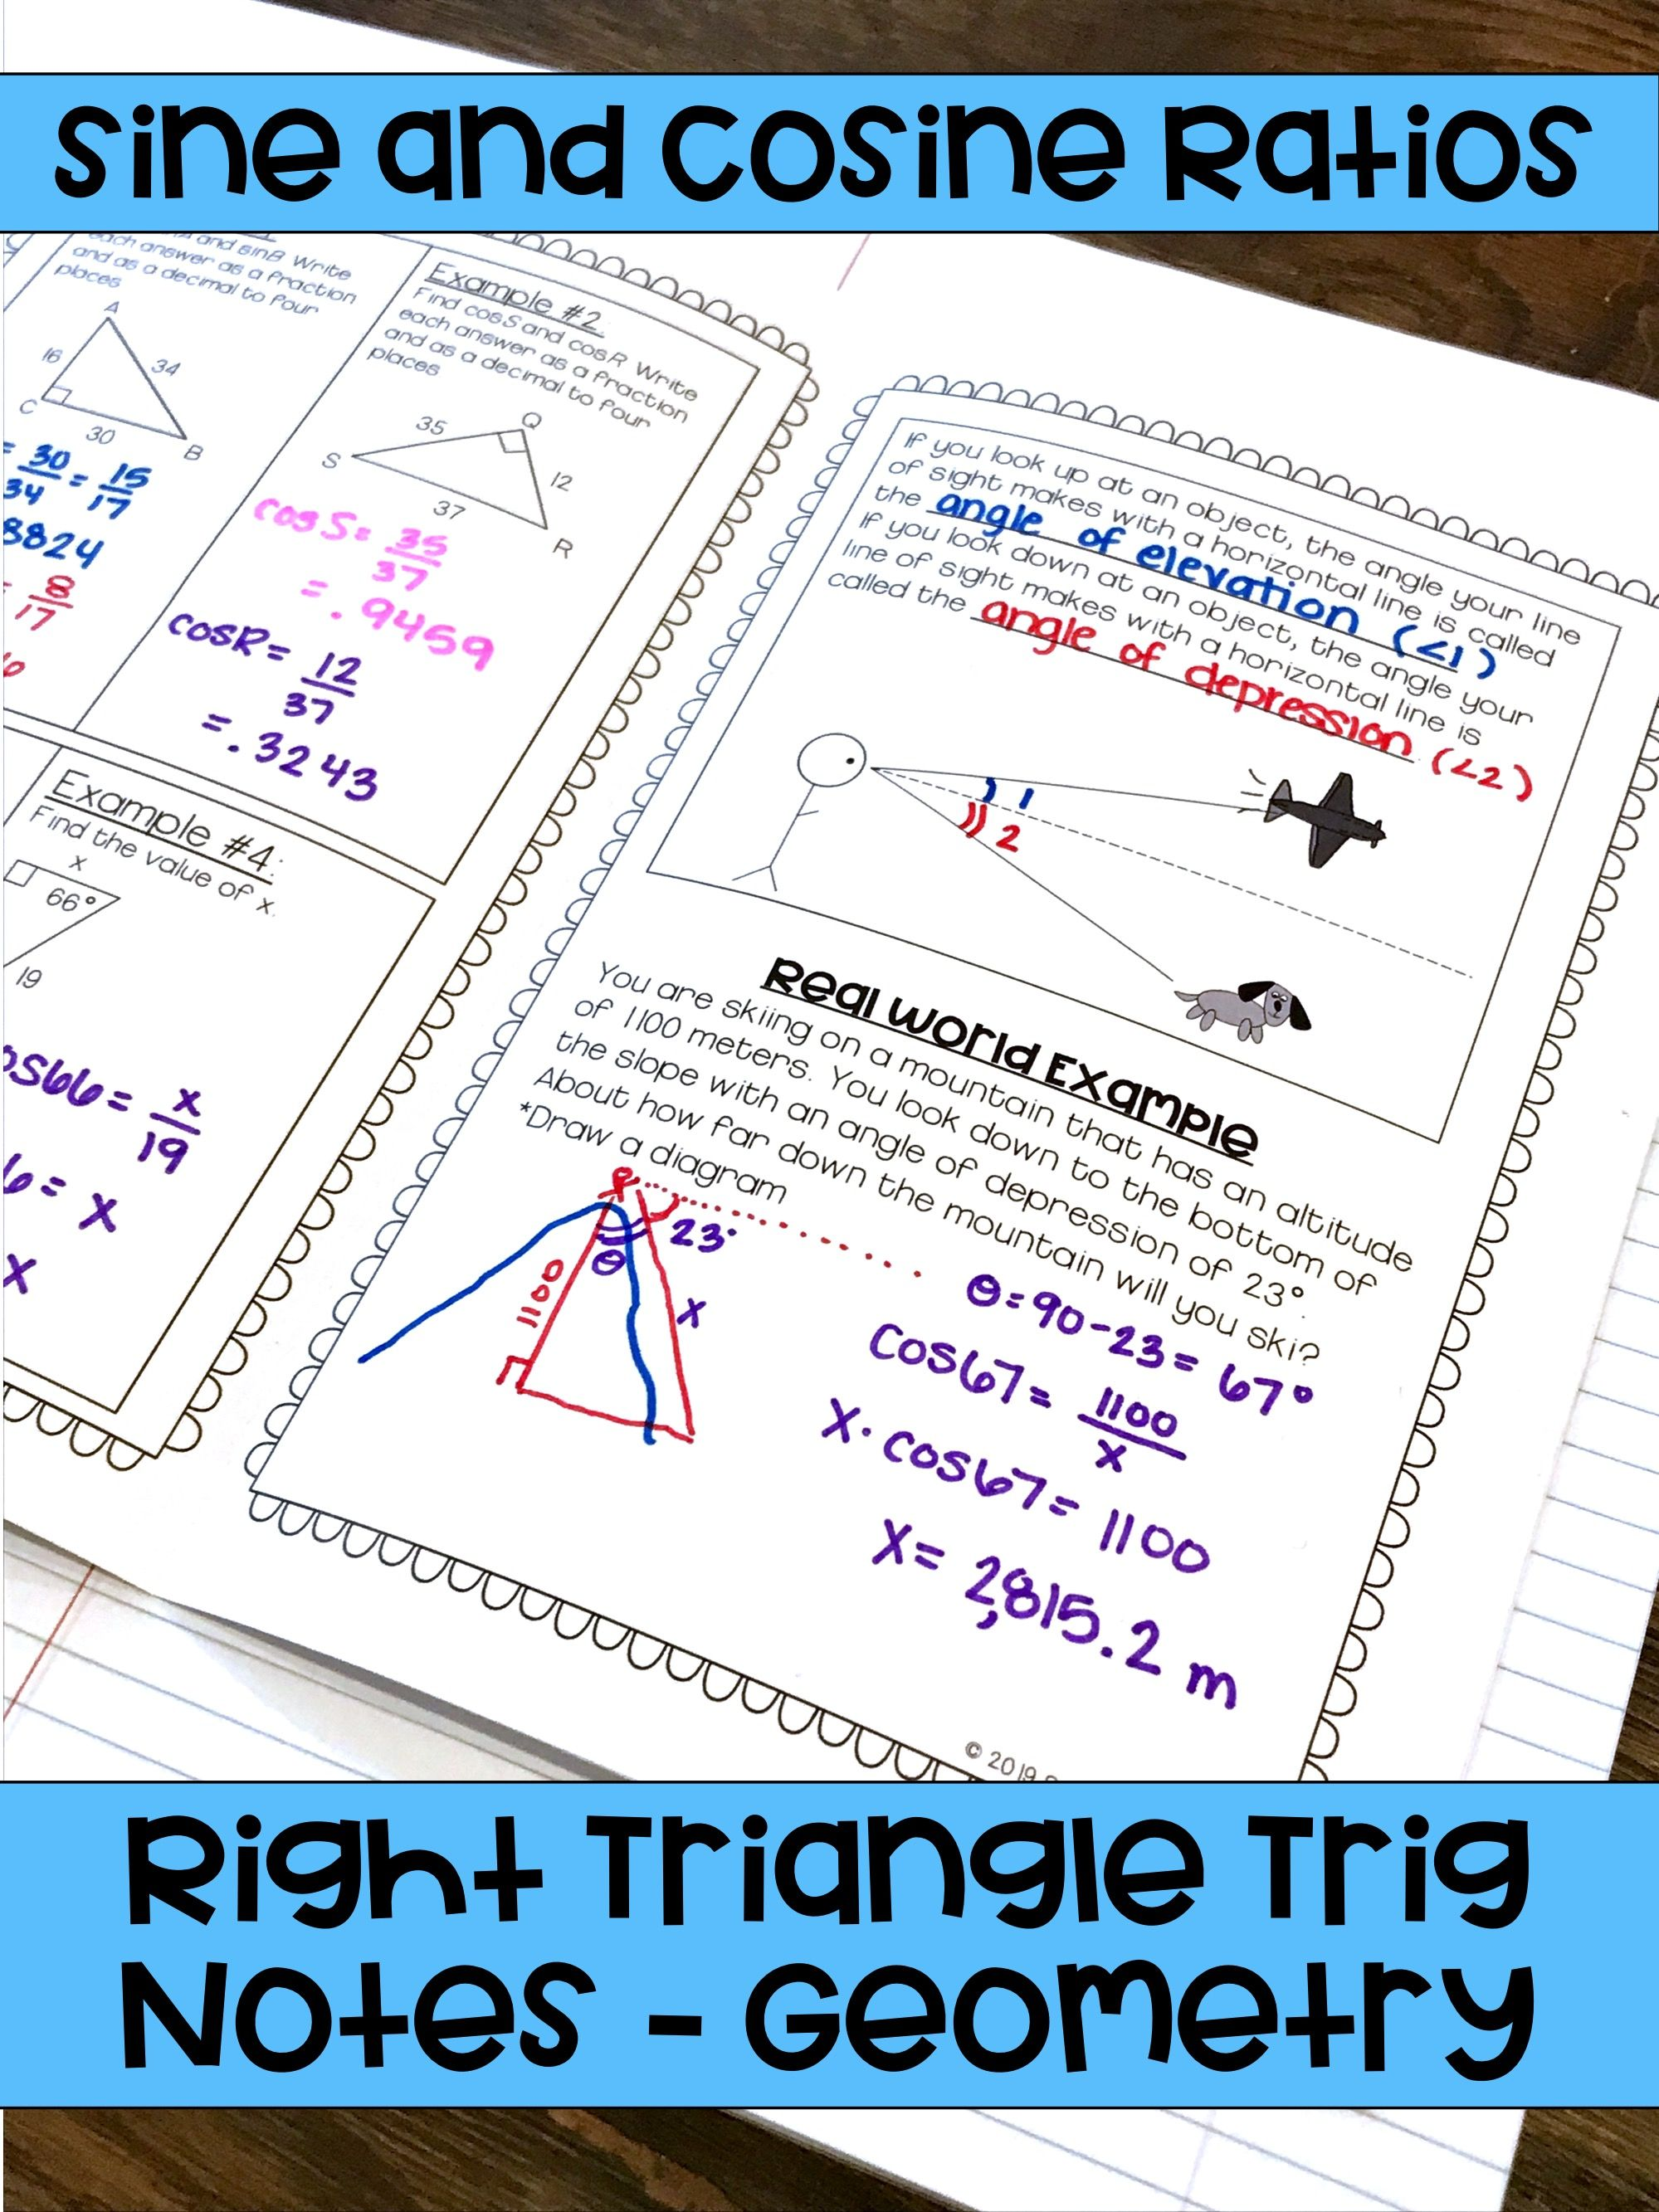 Right Triangle Trigonometry Geometry Unit Notes Trigonometry Right Triangle Geometry Interactive Notebook